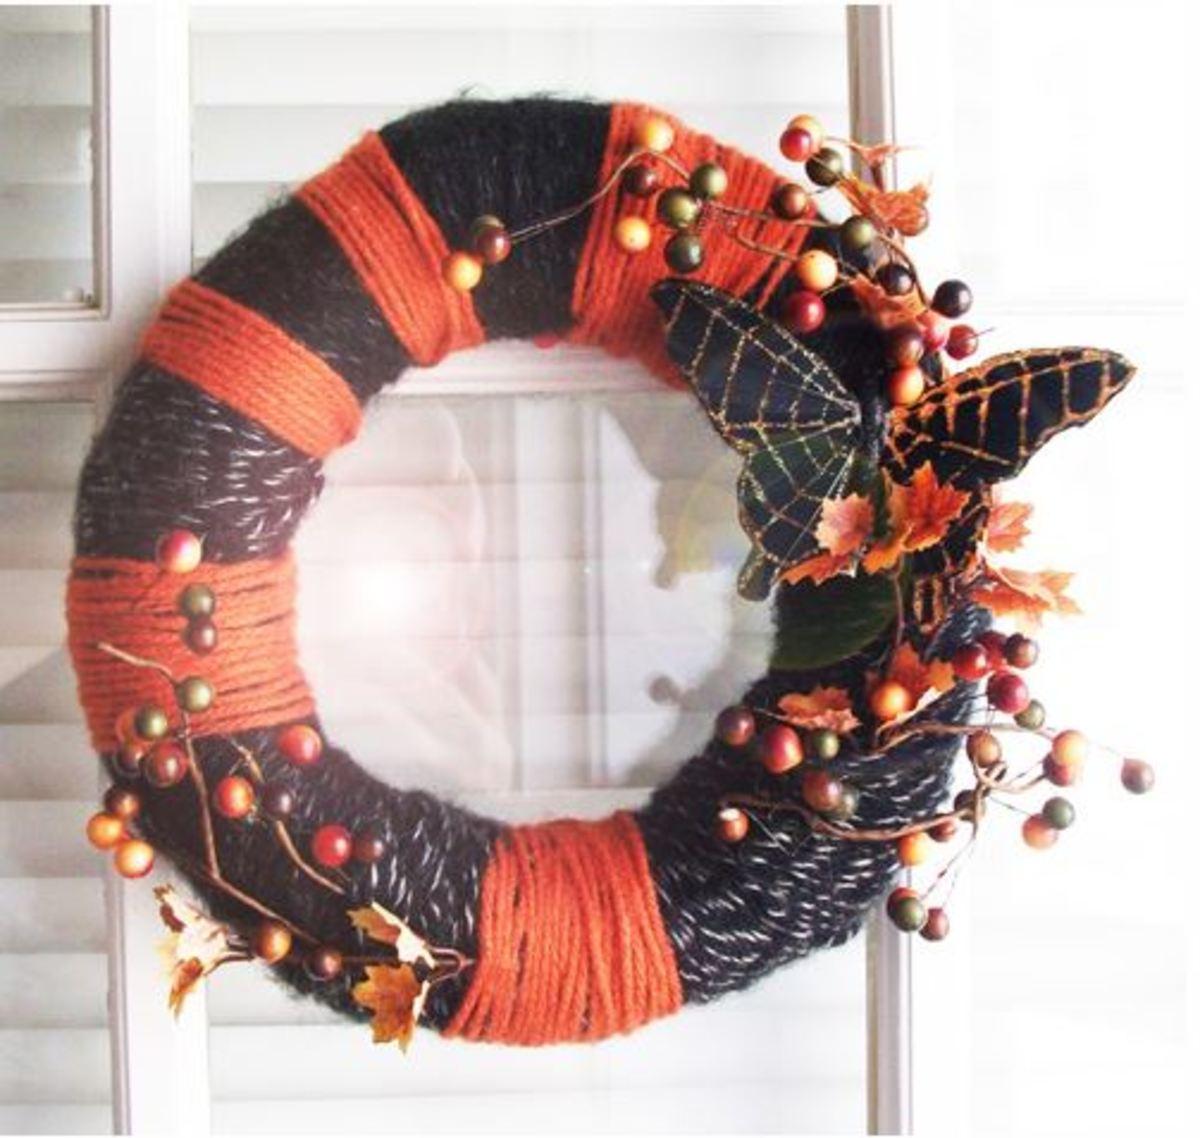 Butterfly wrapped Halloween wreath